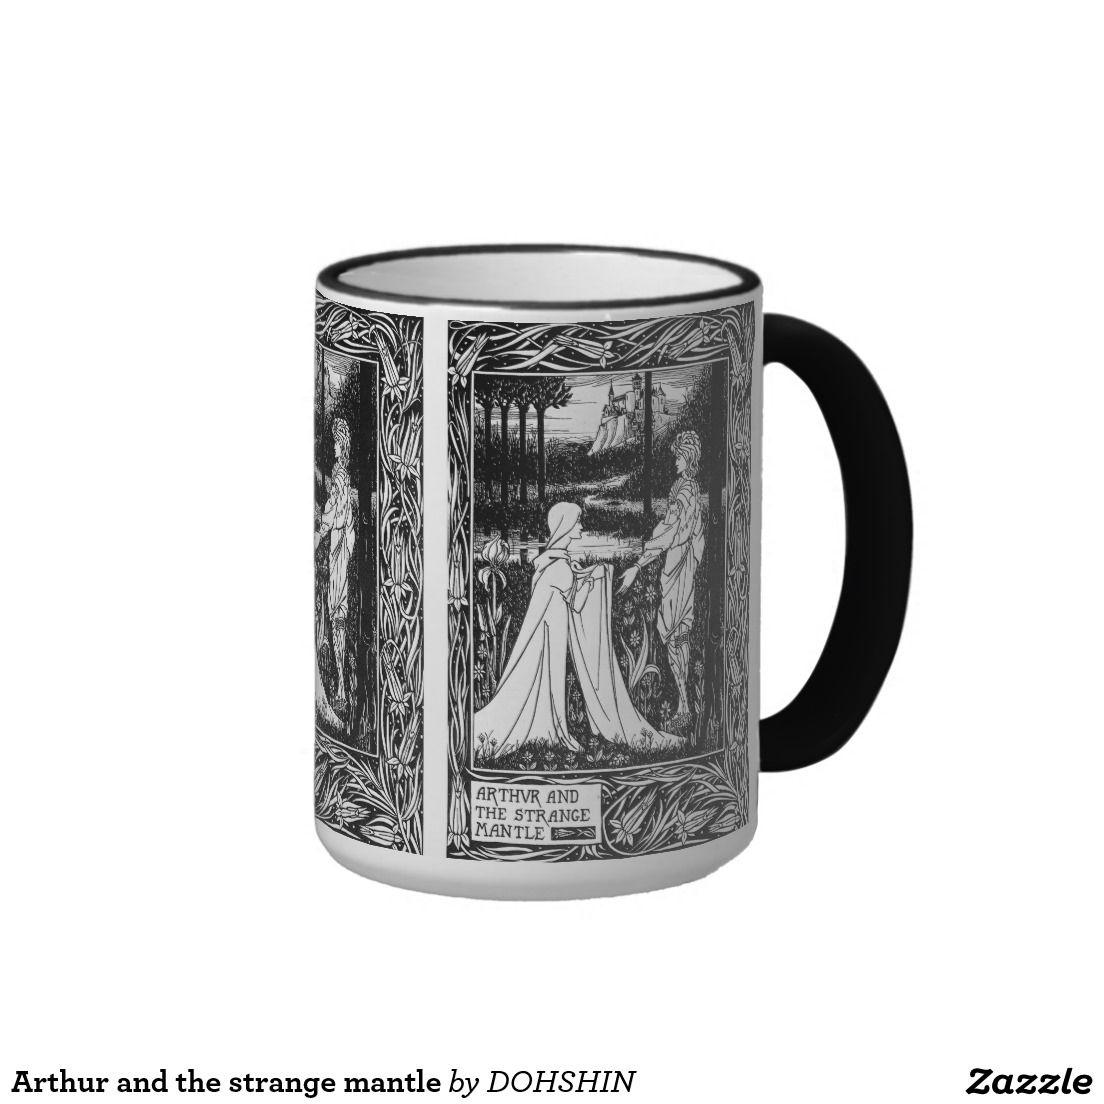 Arthur and the strange mantle リンガーマグカップ